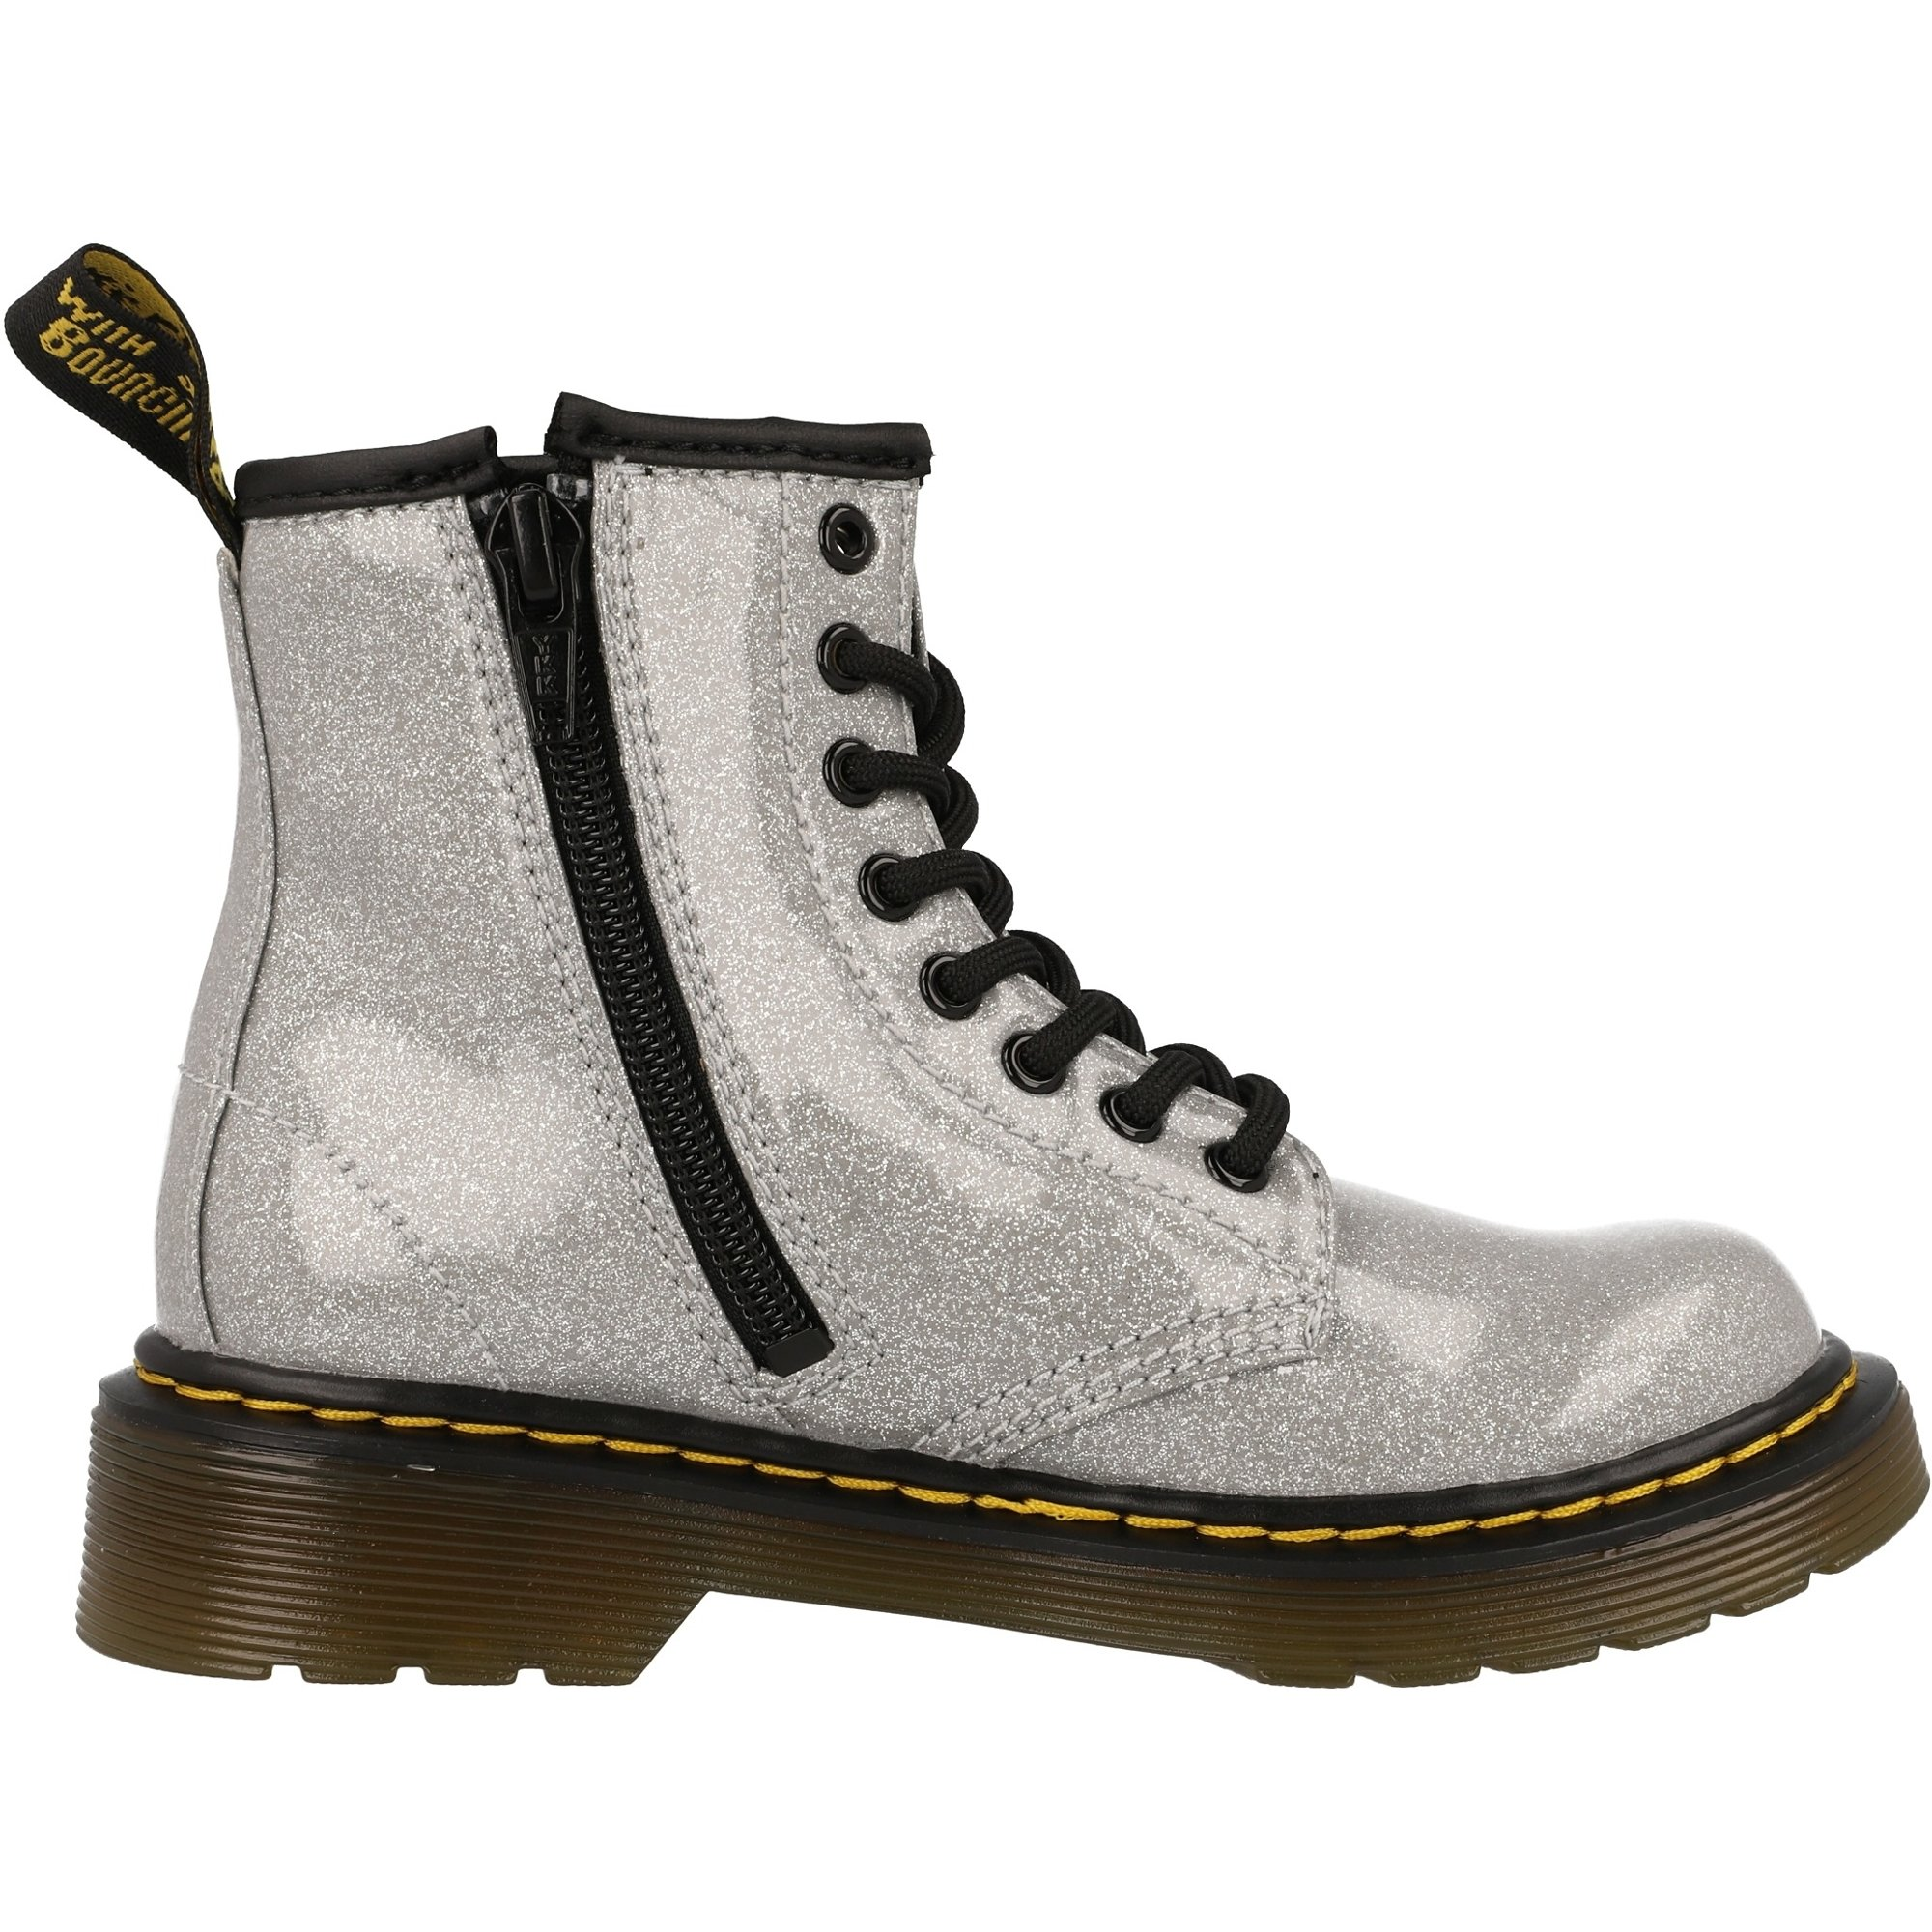 Martens Kids Collection 1460 Glitter Stars Delaney Boot Dr Little Kid//Big Kid